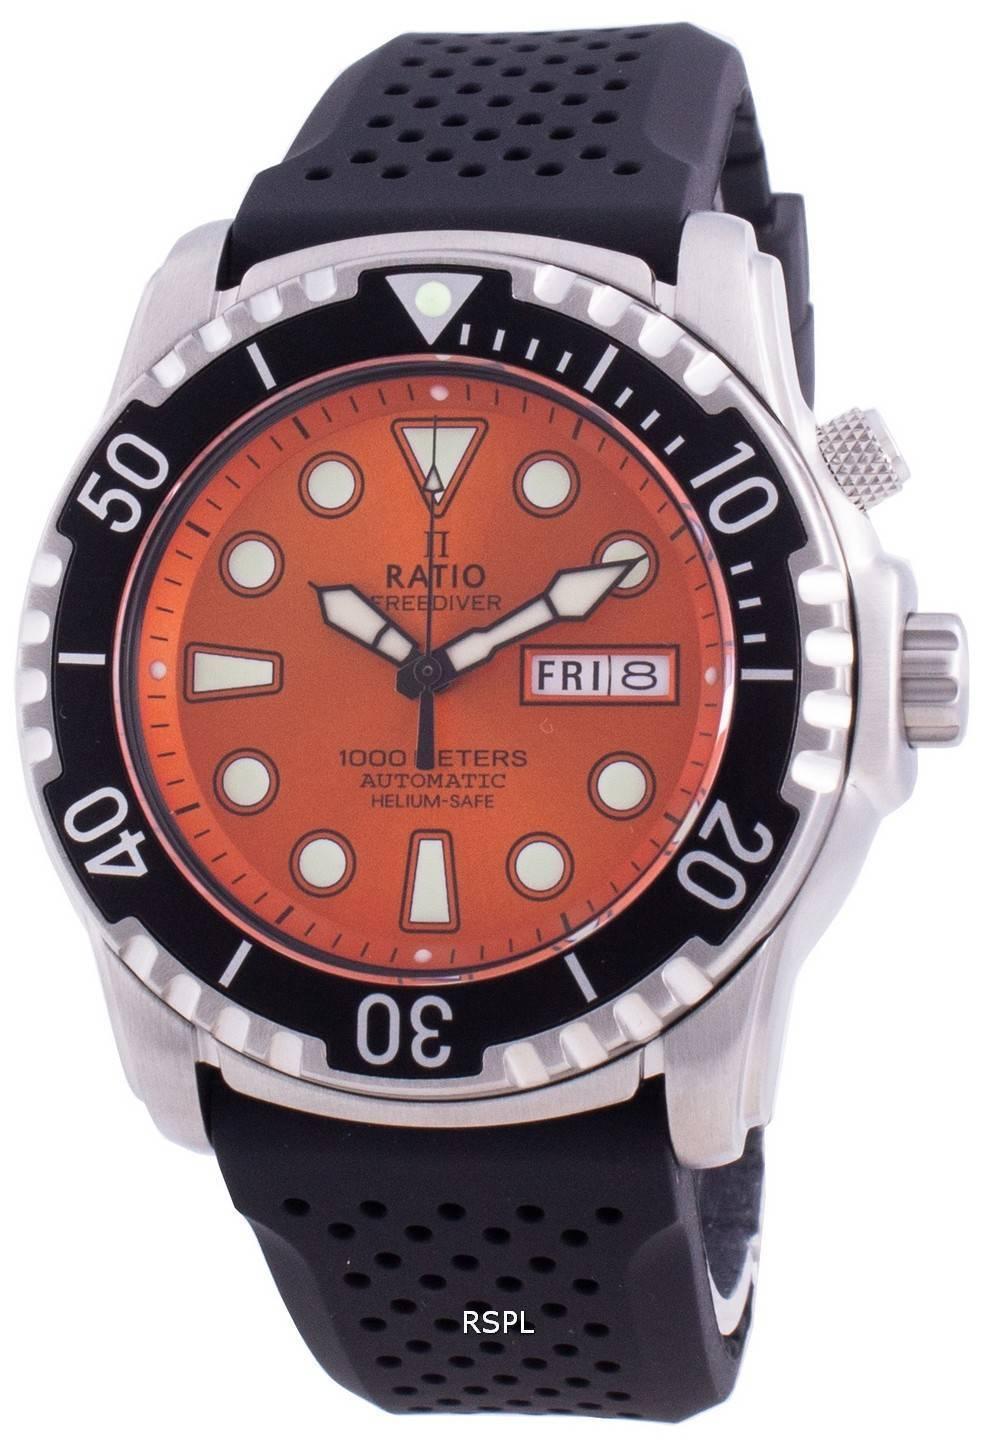 Ratio Free Diver Helium-Safe 1000M Sapphire Automatic 1068HA90-34VA-ORG Men's Watch